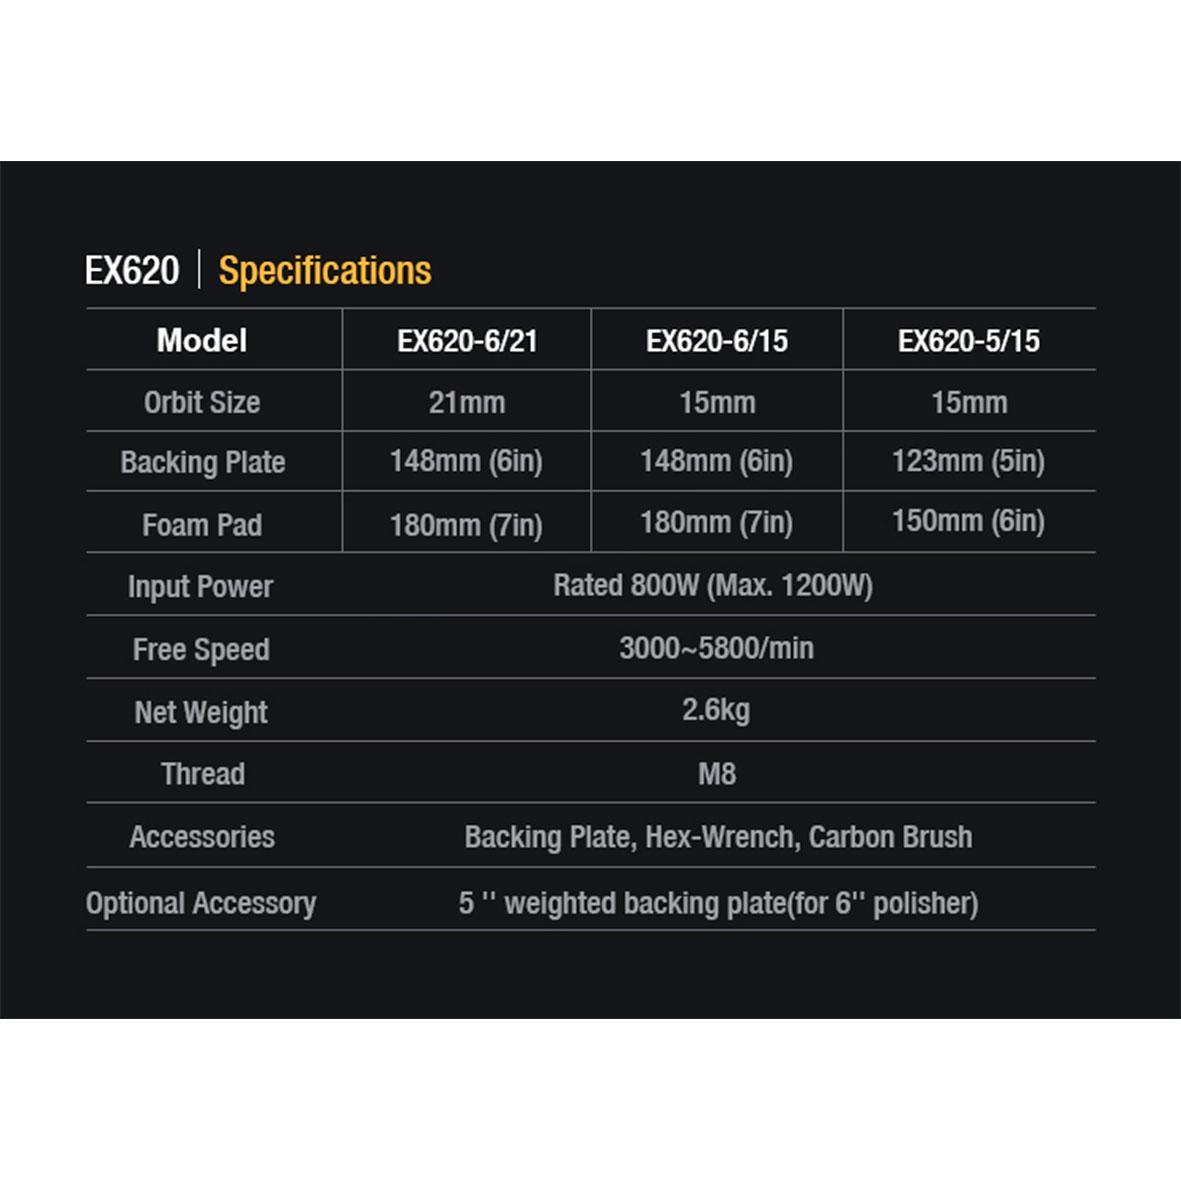 Ficha técnica de la polichadora EX620